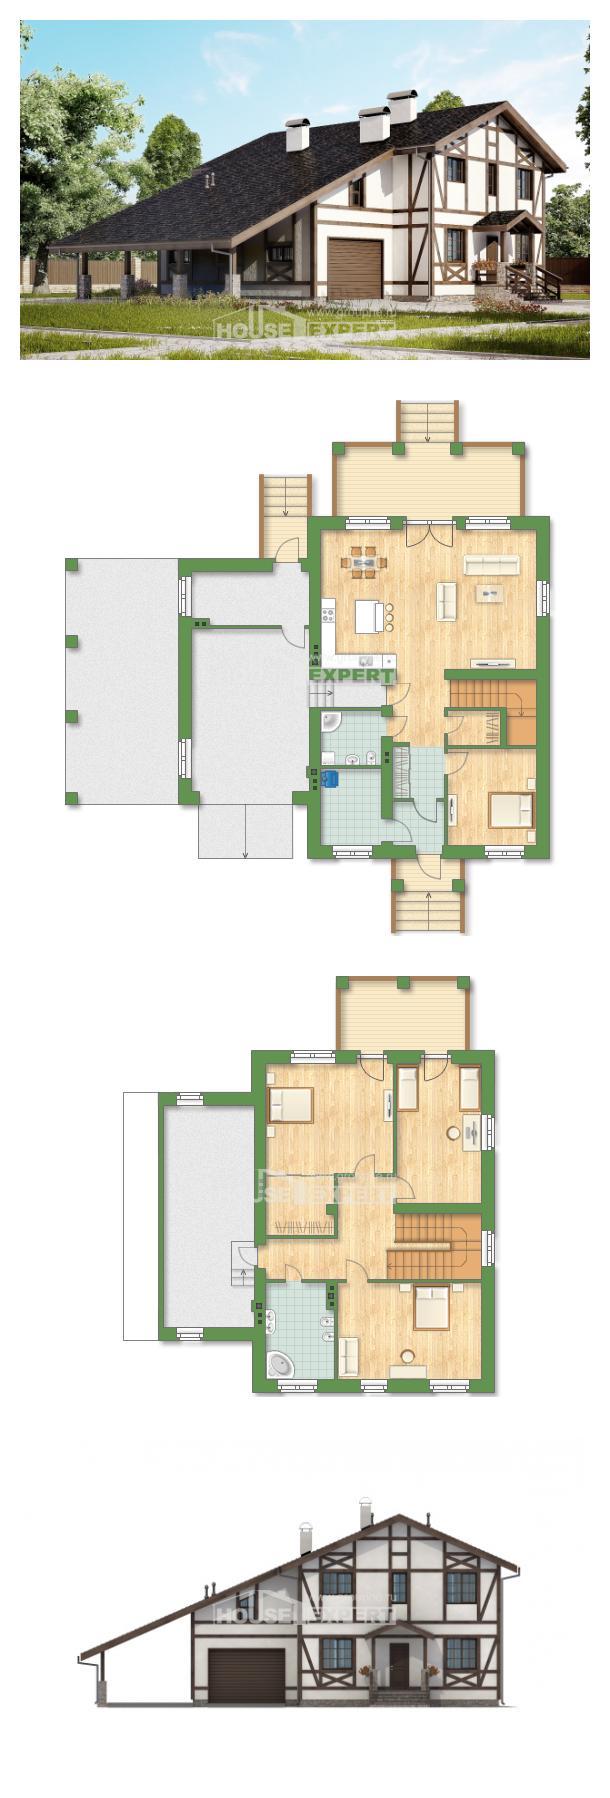 Проект дома 250-002-Л | House Expert